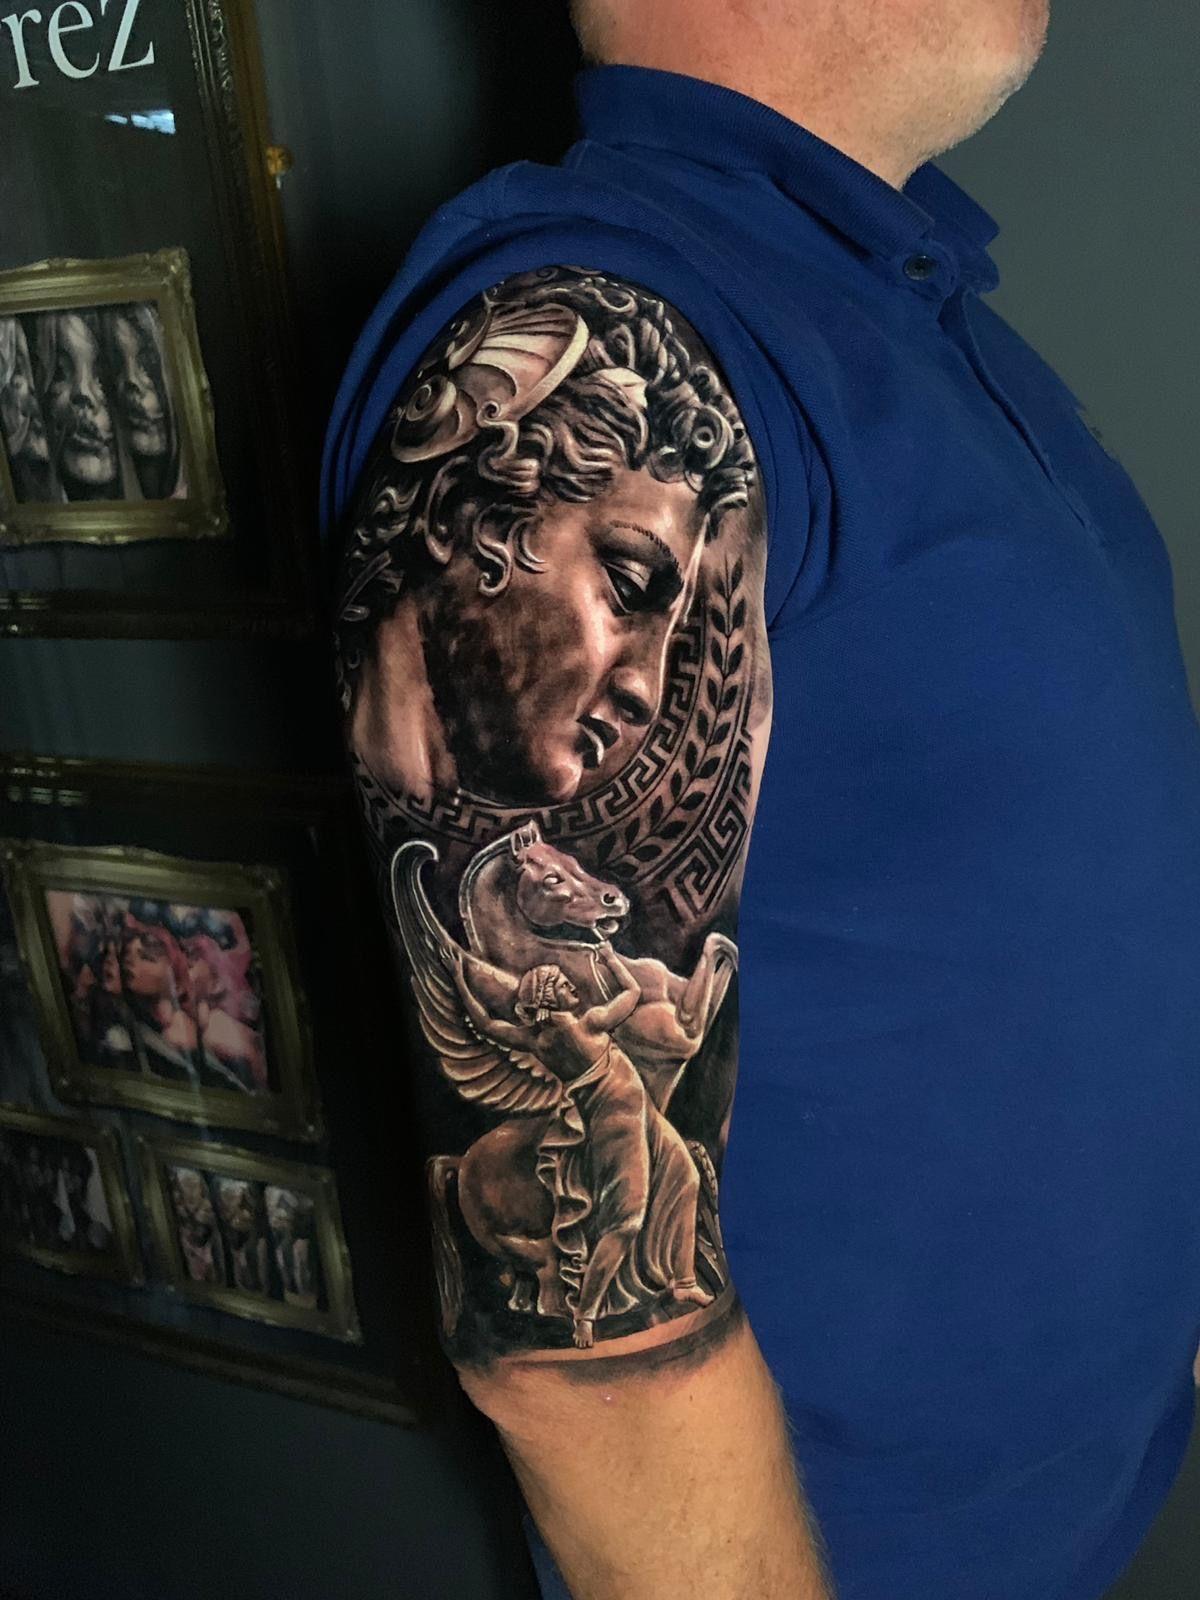 Perseus Pegasus Greek Mythology Tattoo By Teo Limited